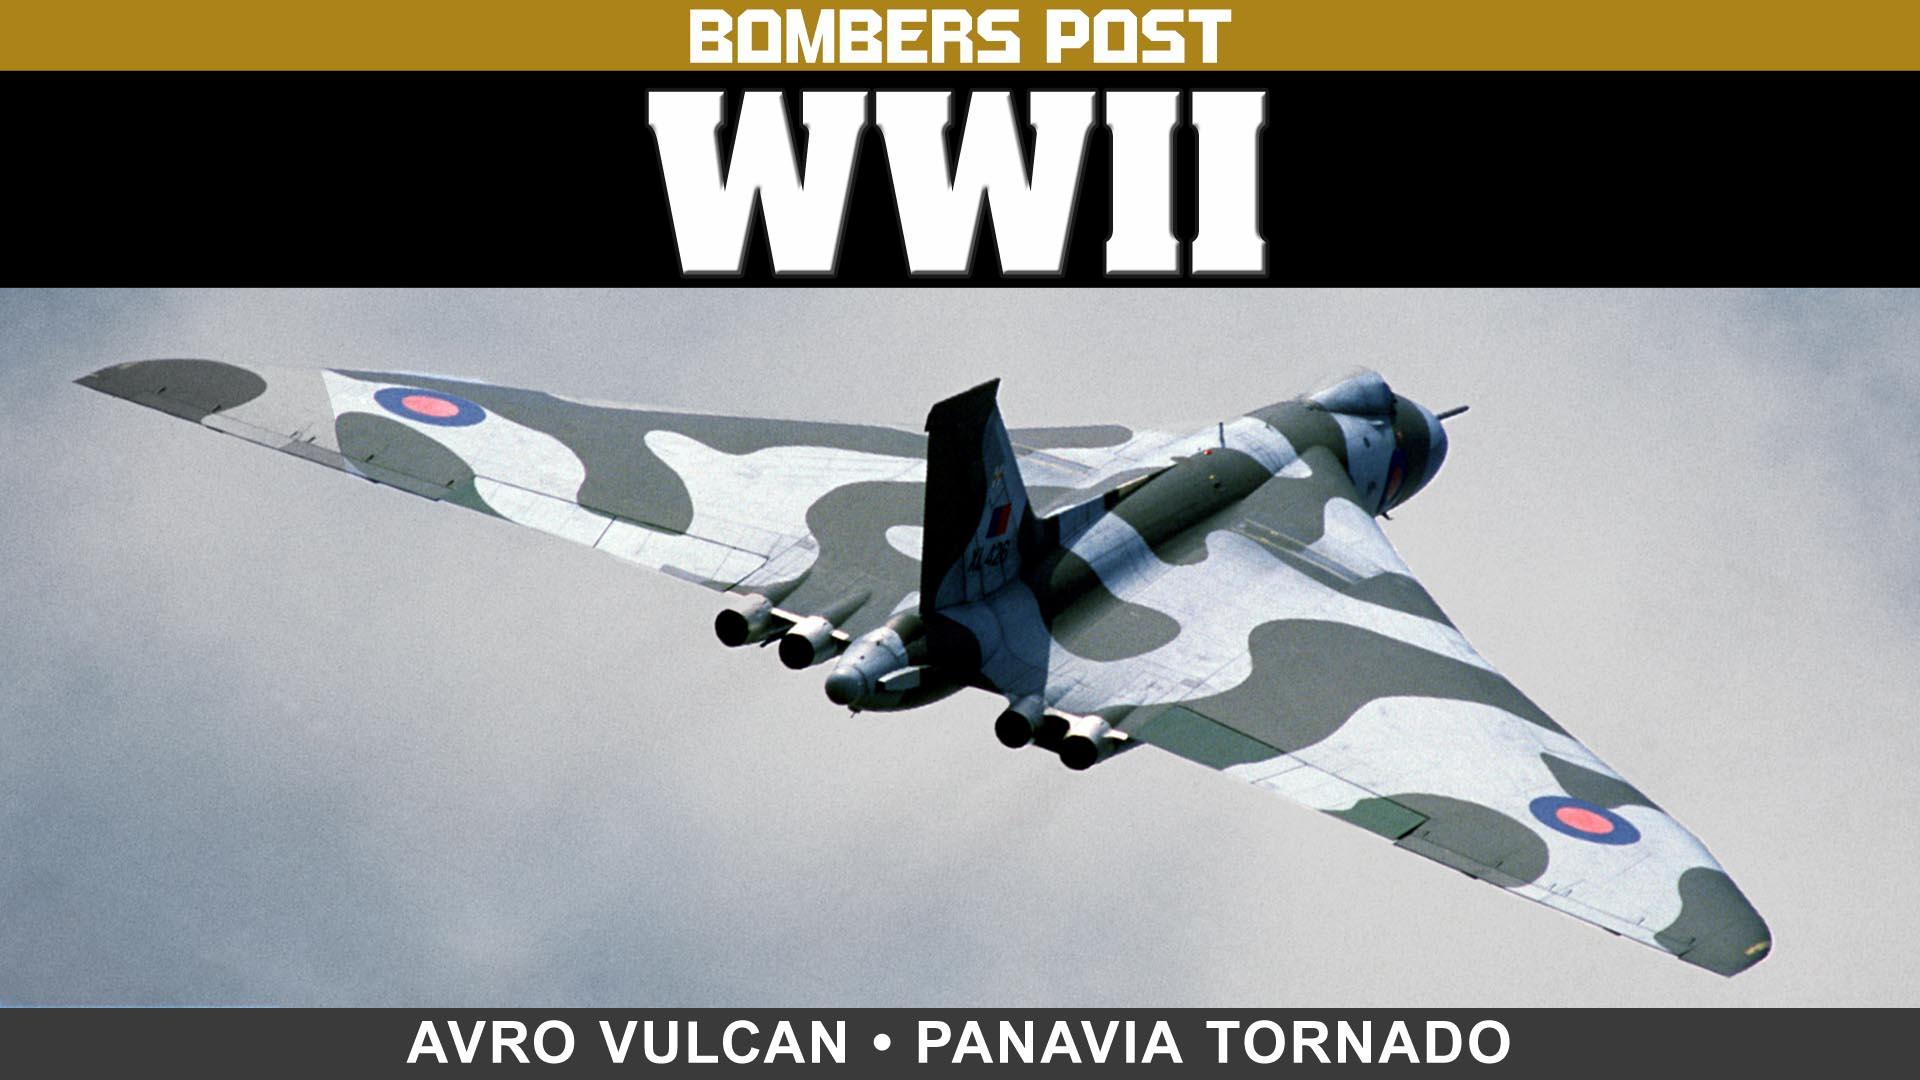 Bombers Post WWII: Avro Vulcan and Panavia Tornado -